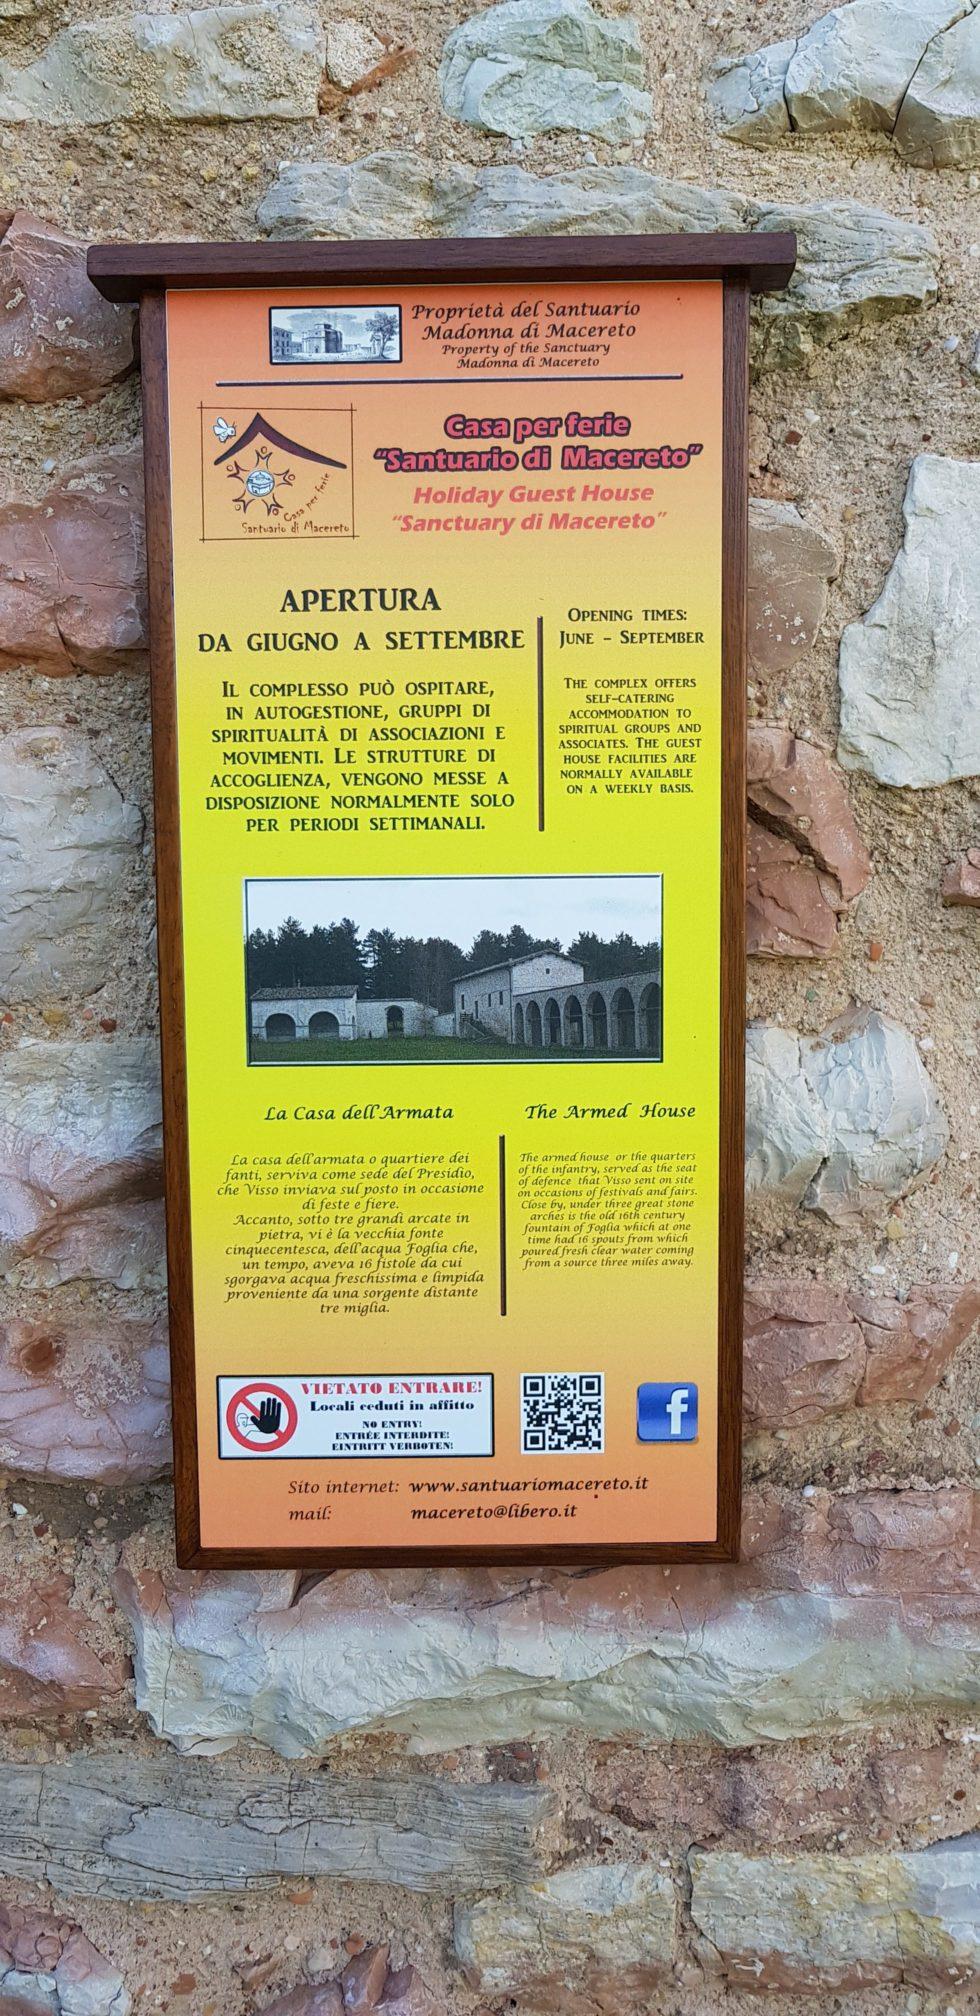 santuario macereto info blog 2